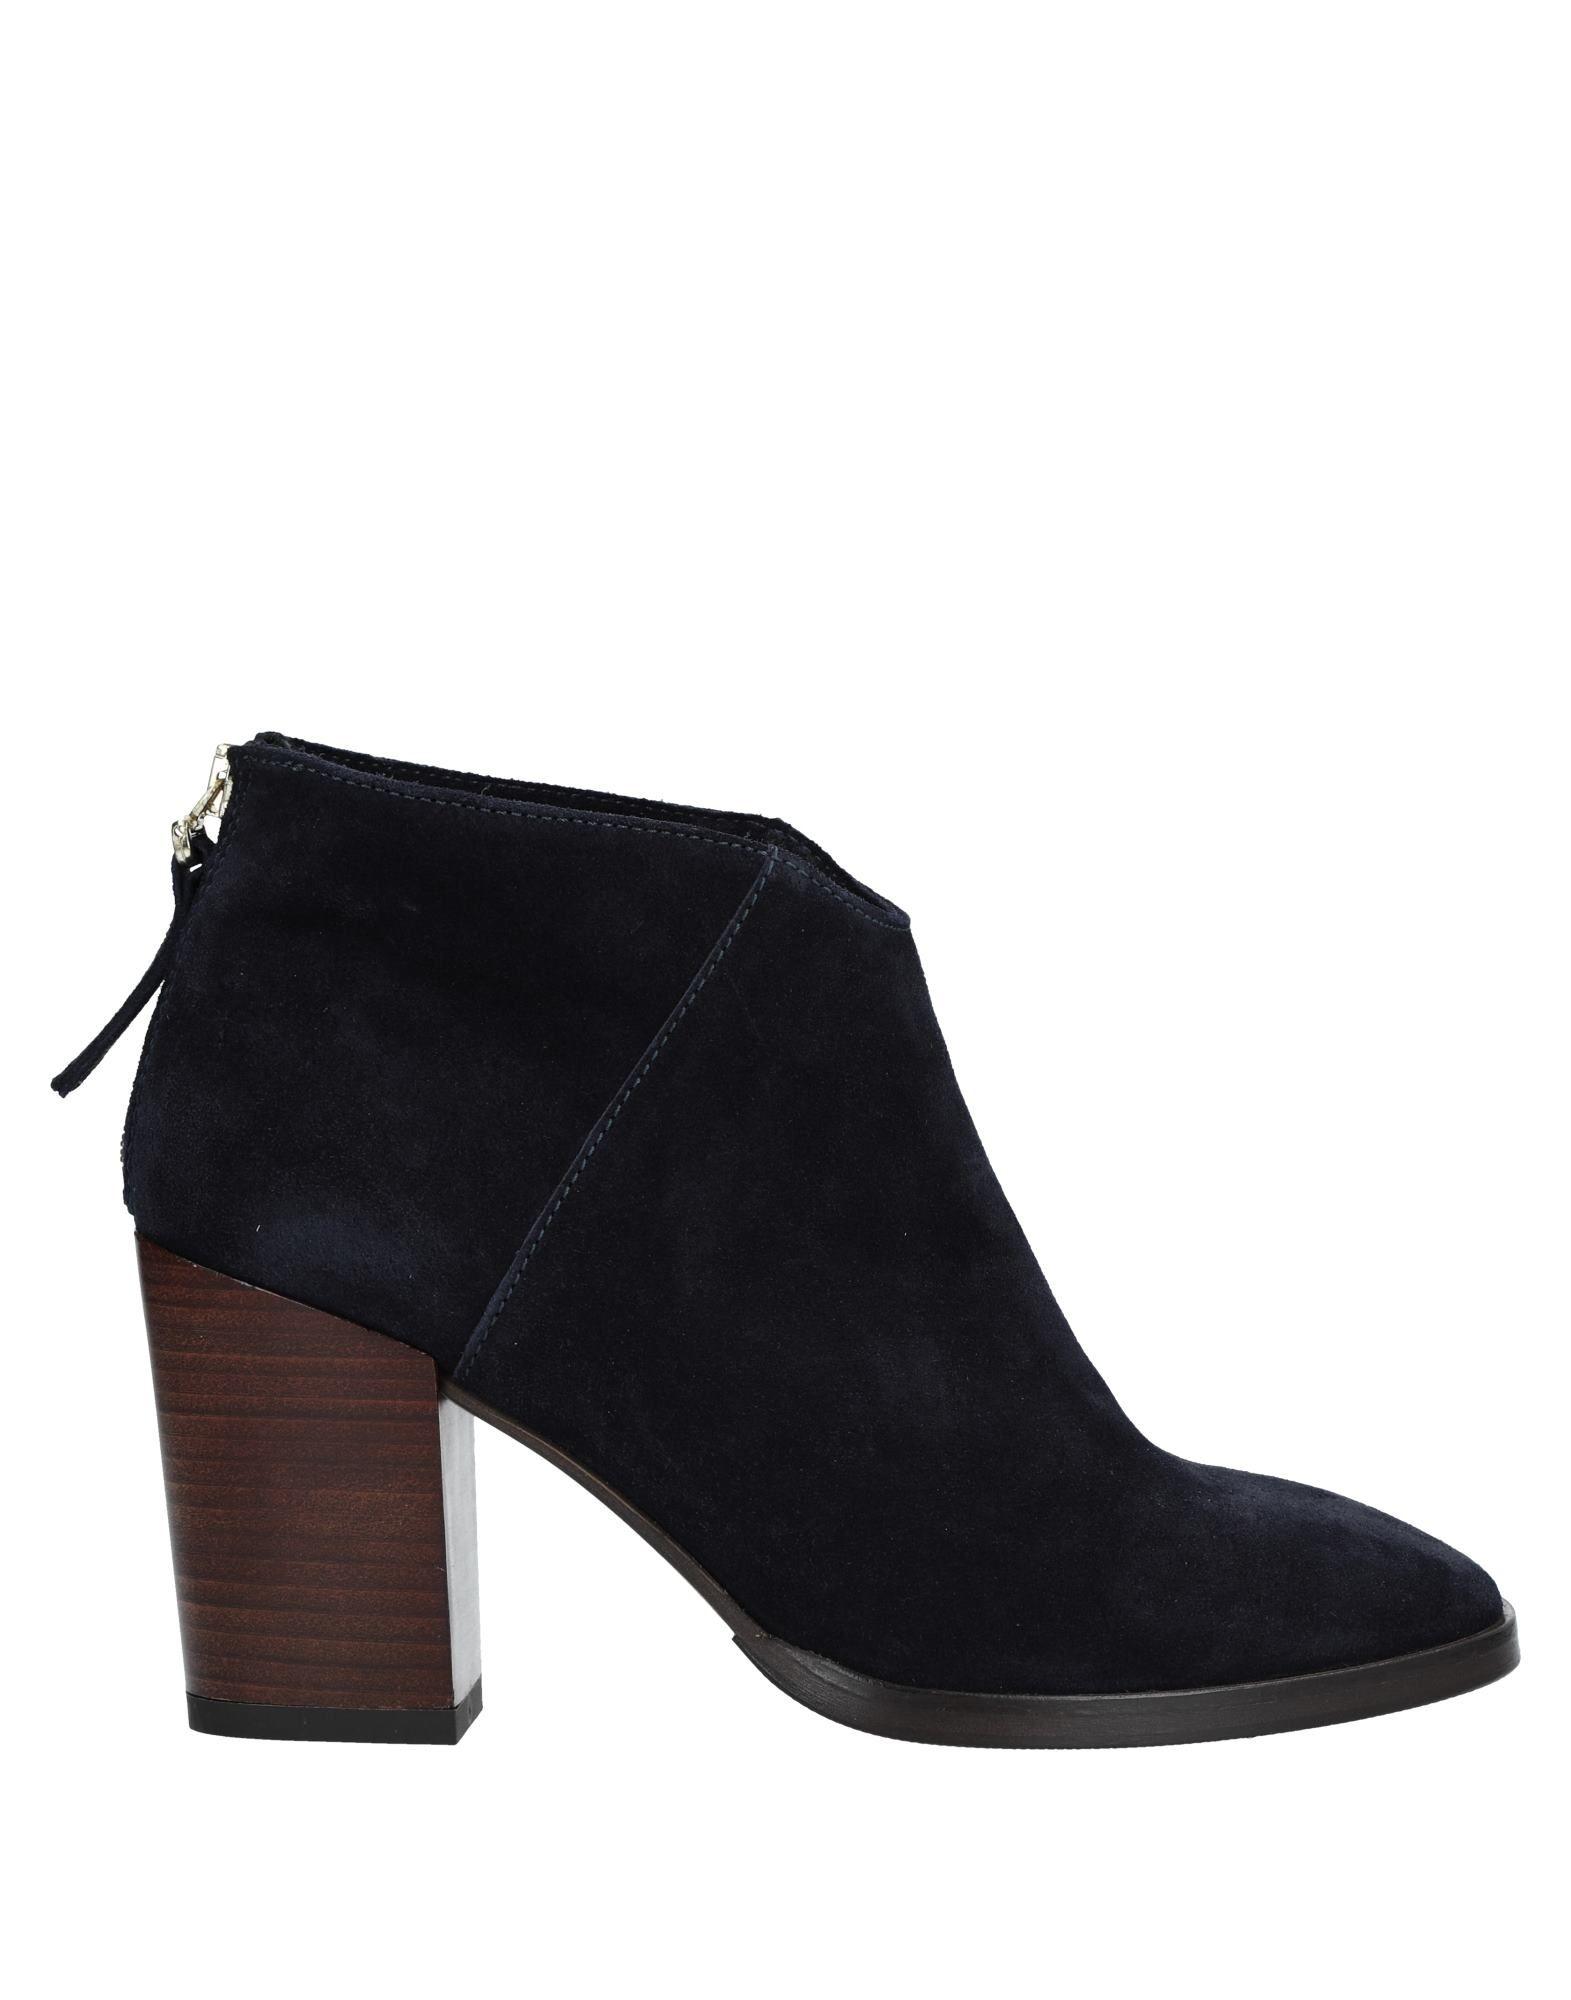 Carmens Stiefelette Damen  11270241ET Gute Qualität beliebte Schuhe